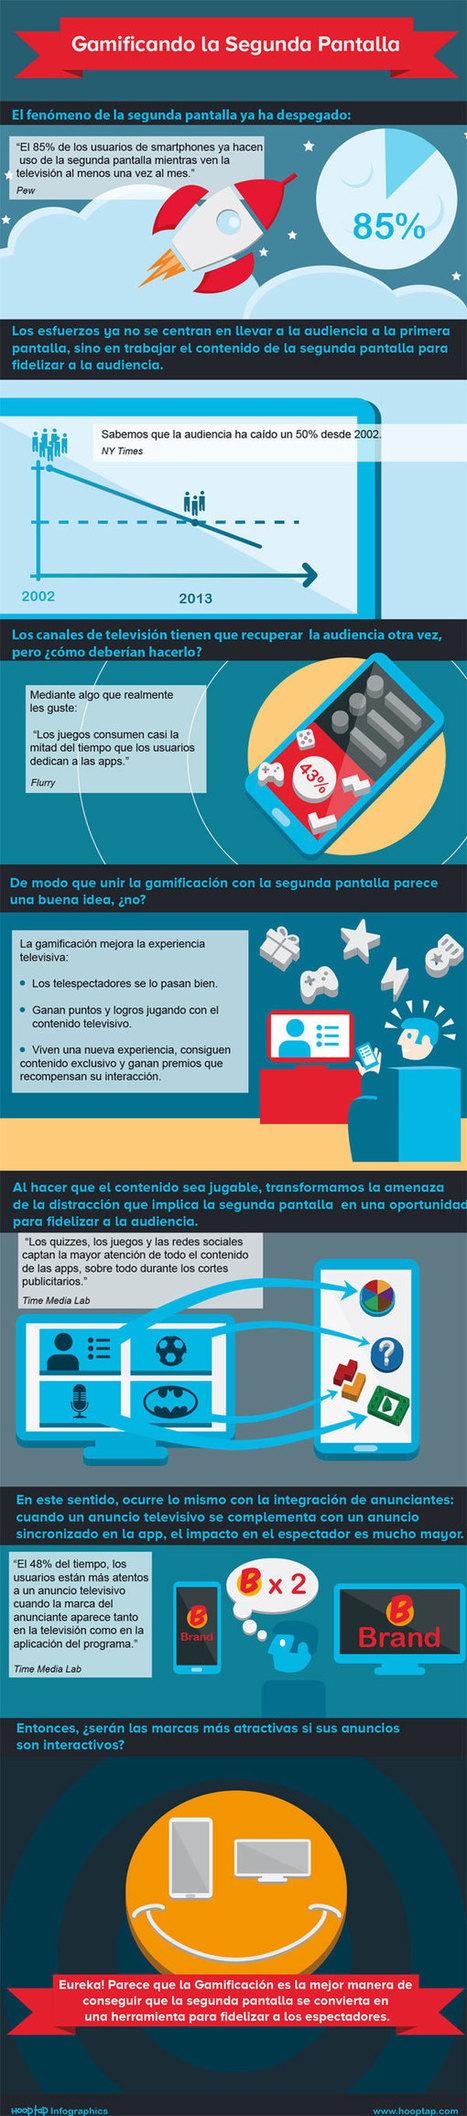 Gamificando la segunda pantalla #infografia #infographic #marketing   Seo, Social Media Marketing   Scoop.it